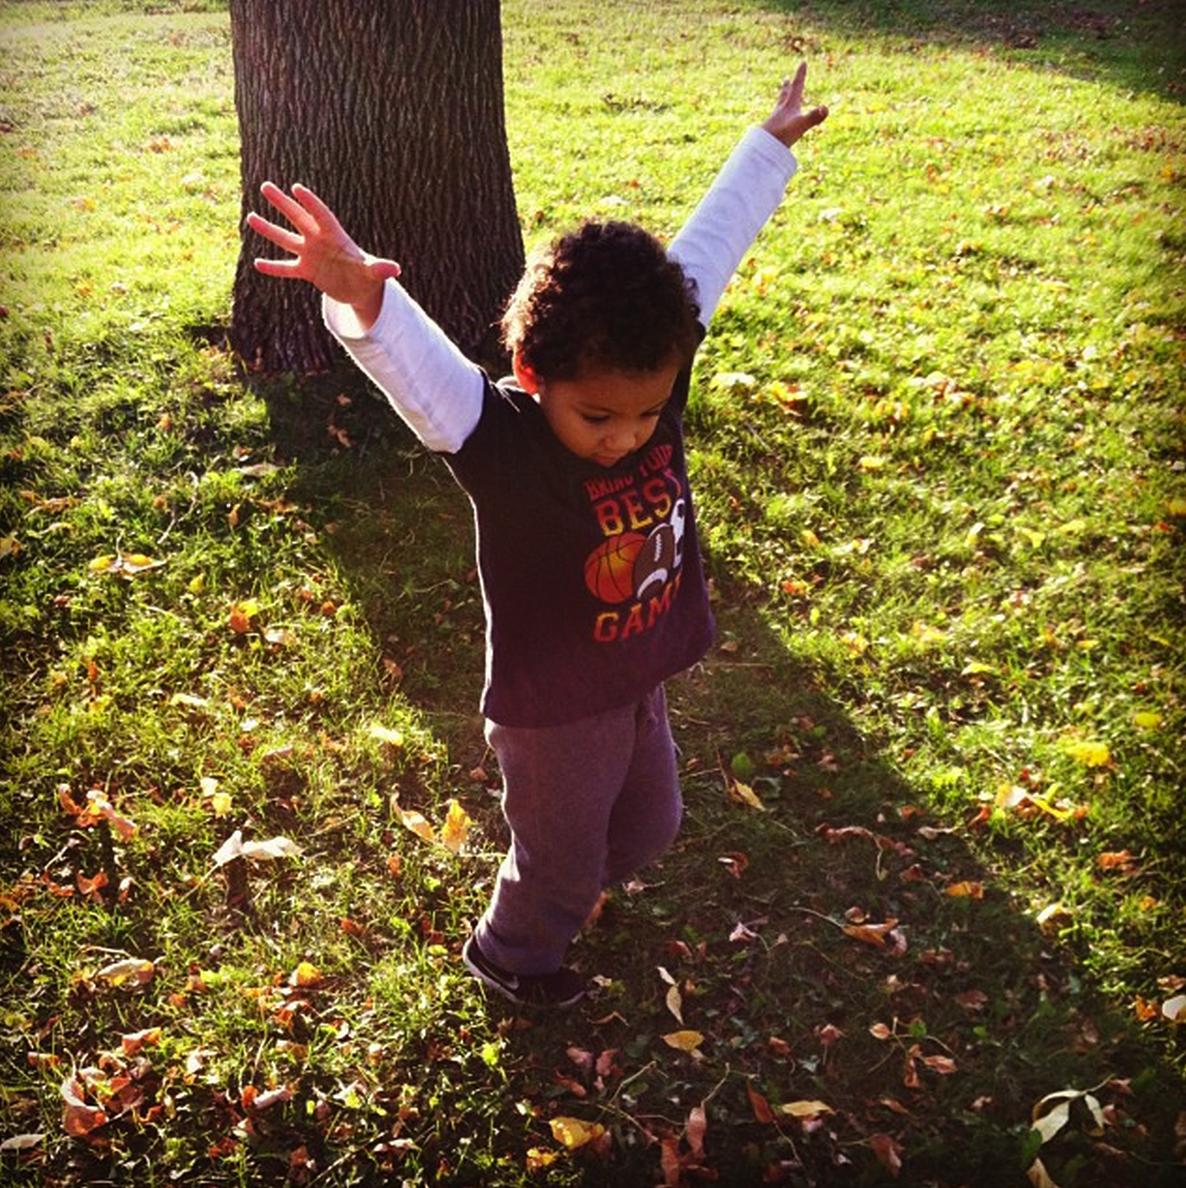 superman_fall_day